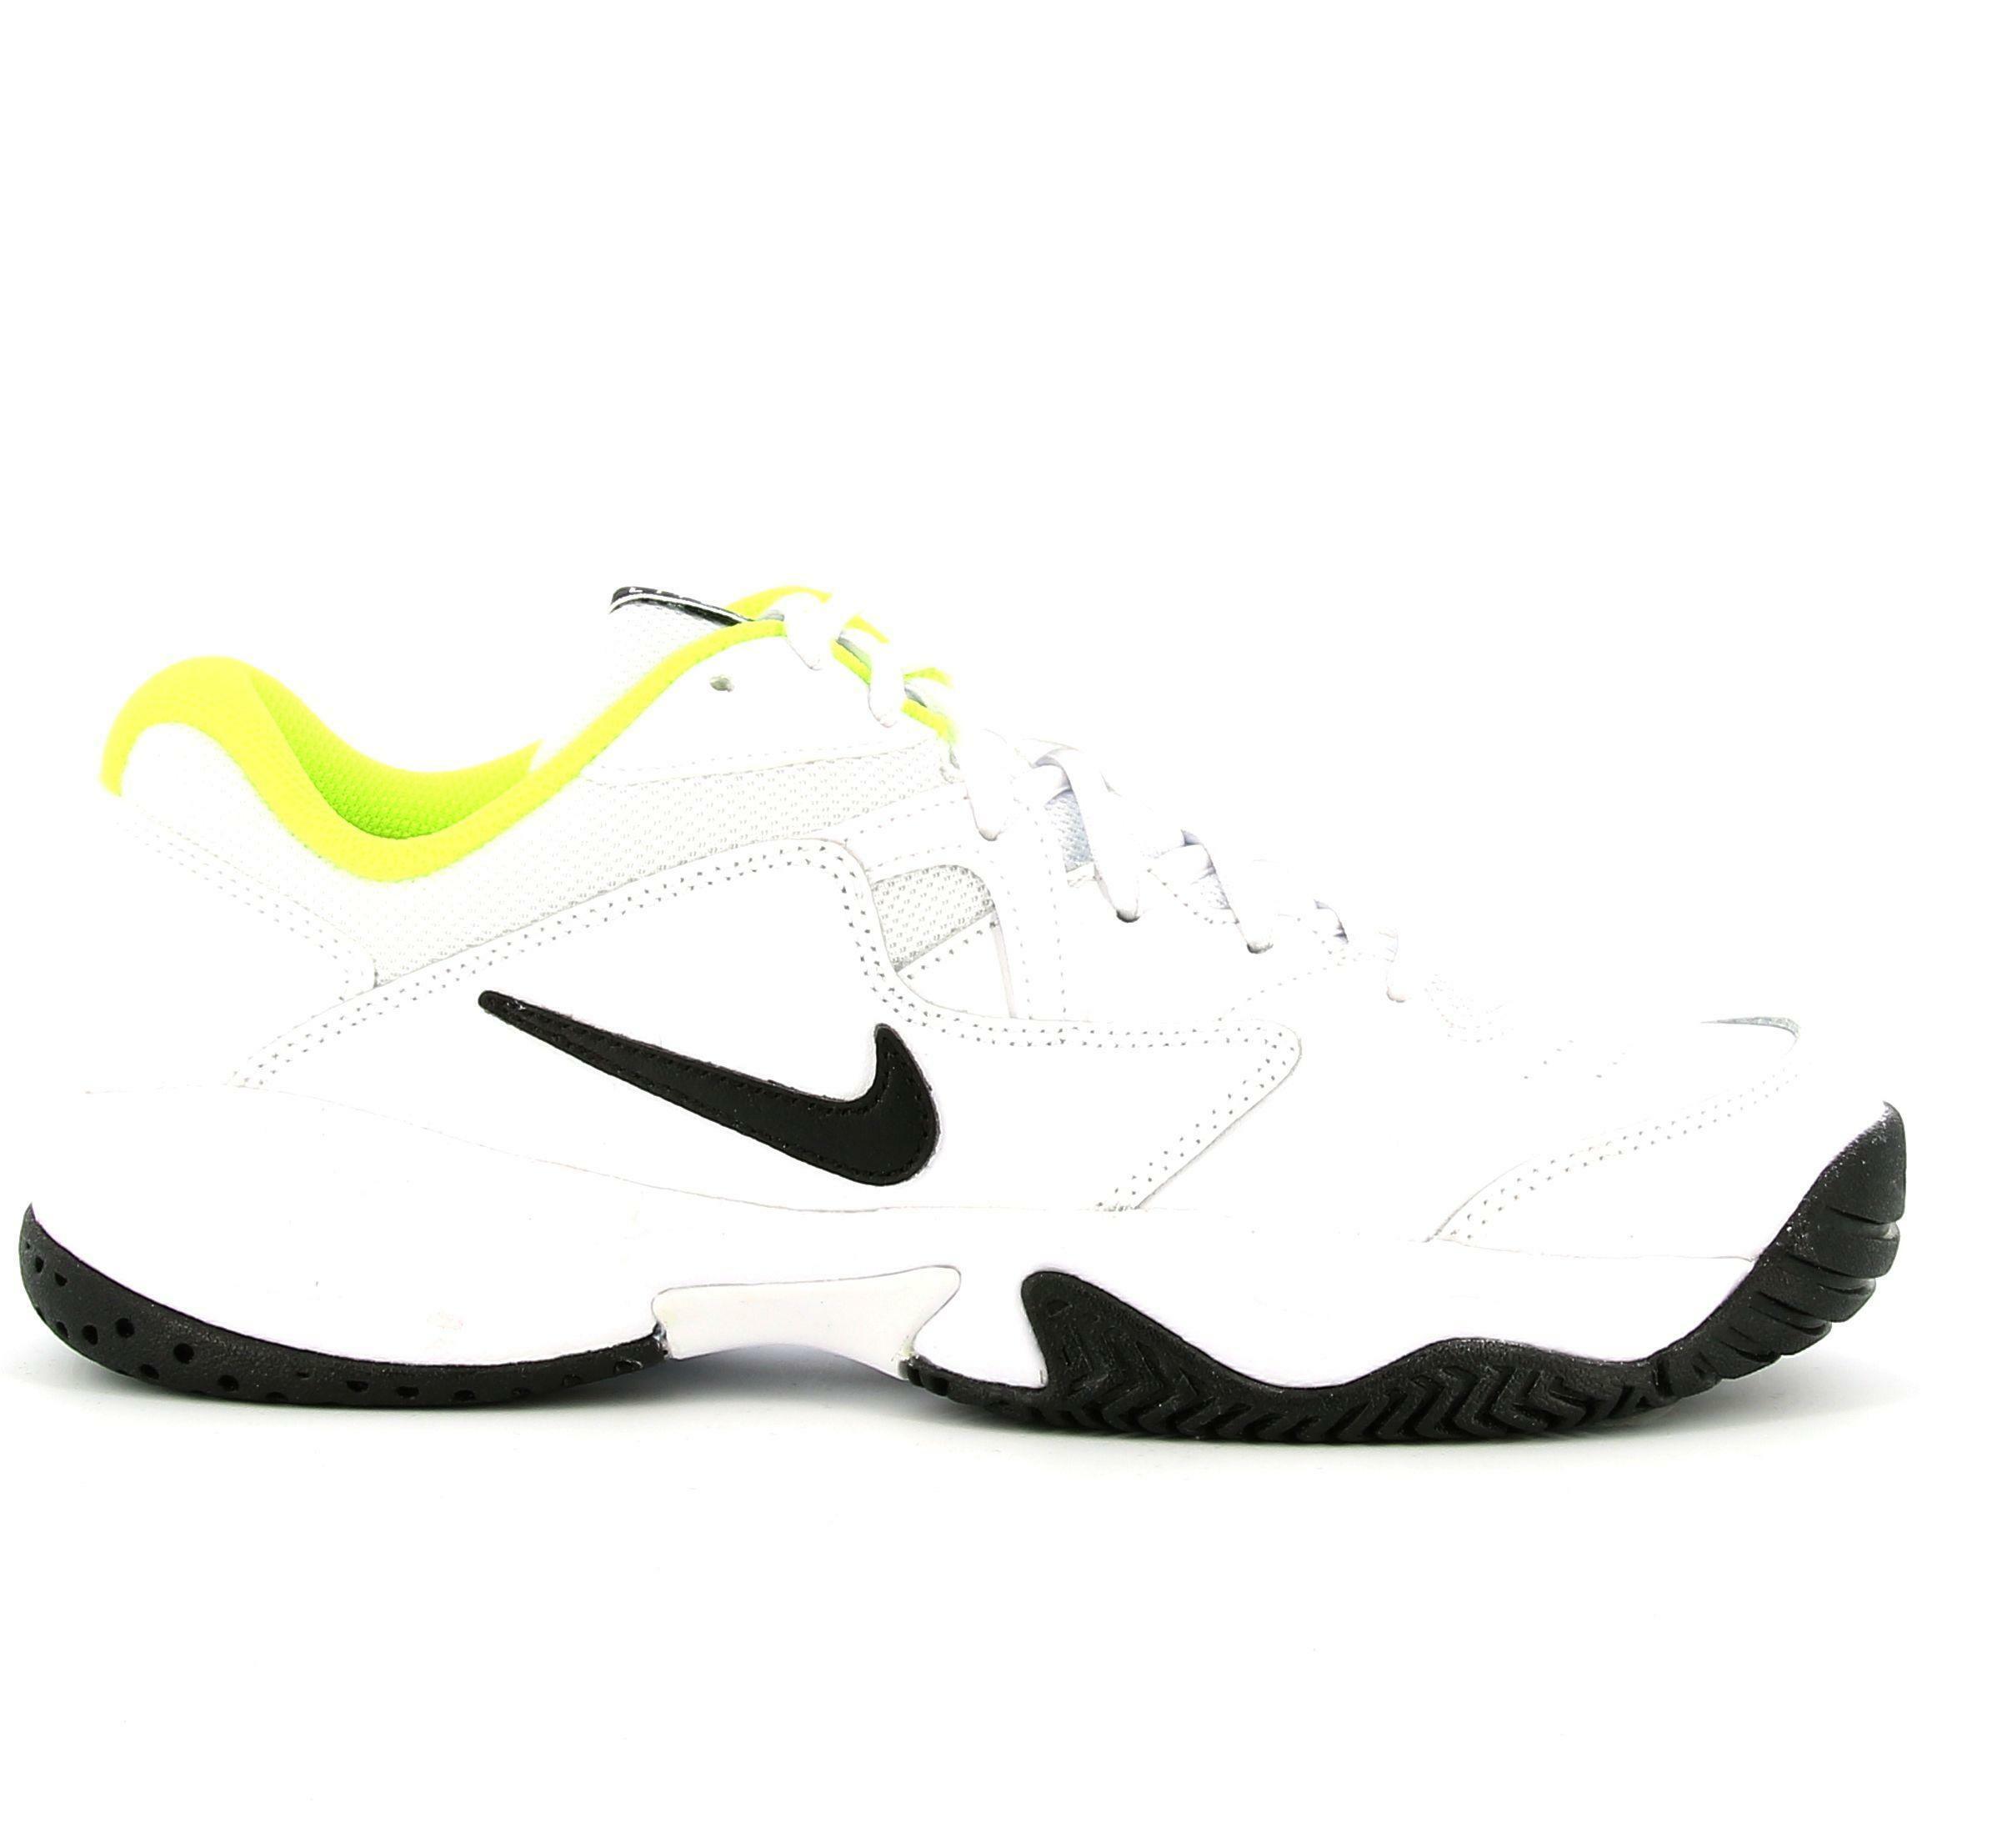 nike nike court lite 2 uomo ar8836 107 bianco scarpe da tennis uomo